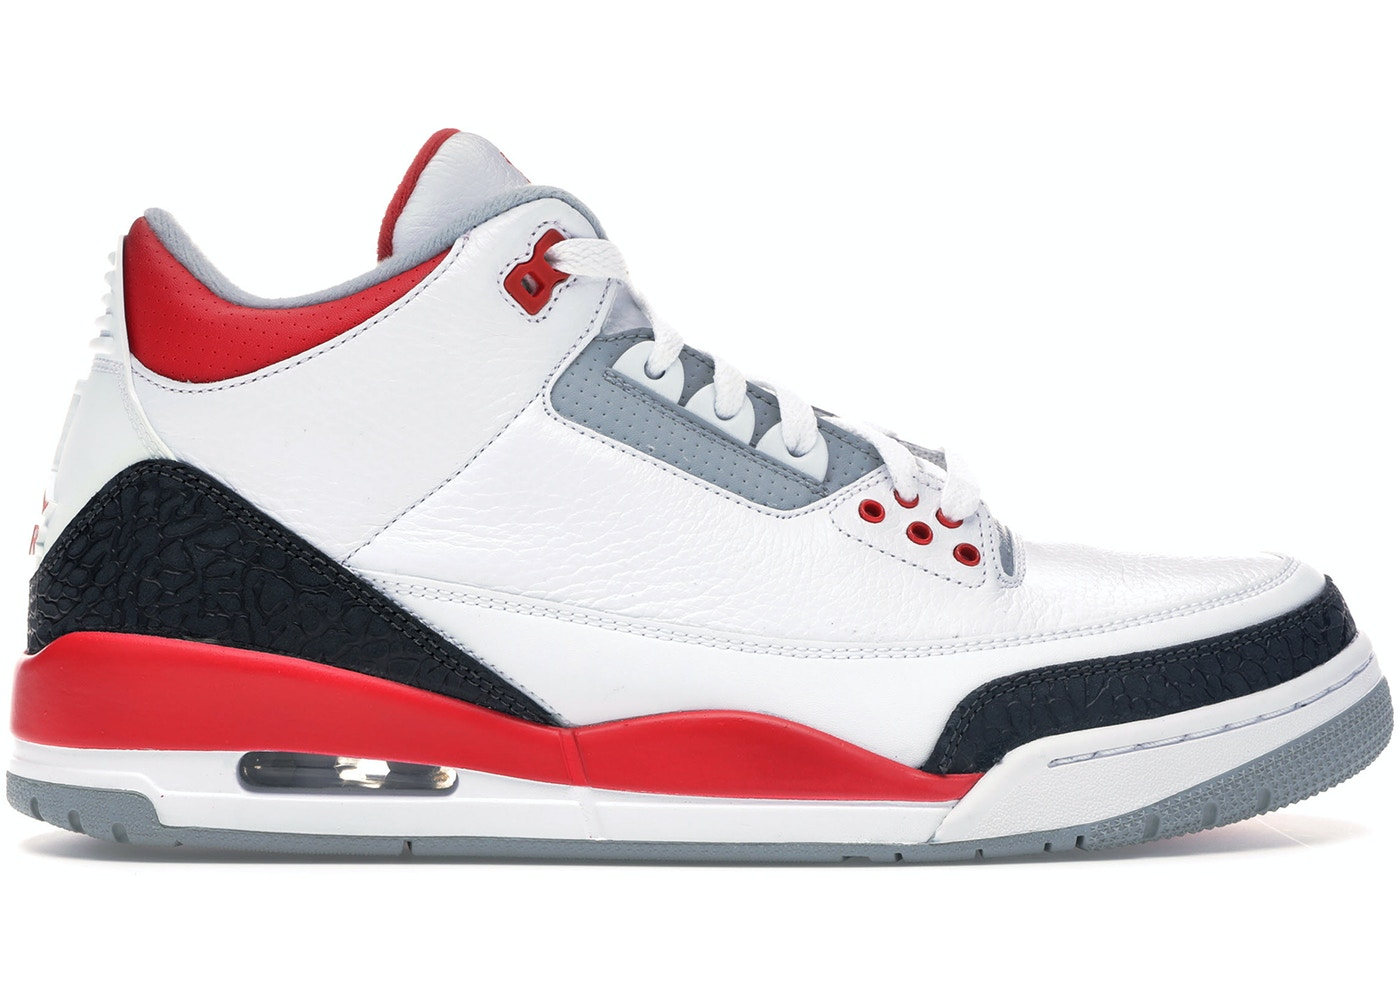 best cheap 168fb af66e Jordan 3 Retro Fire Red (2013) - 136064-120